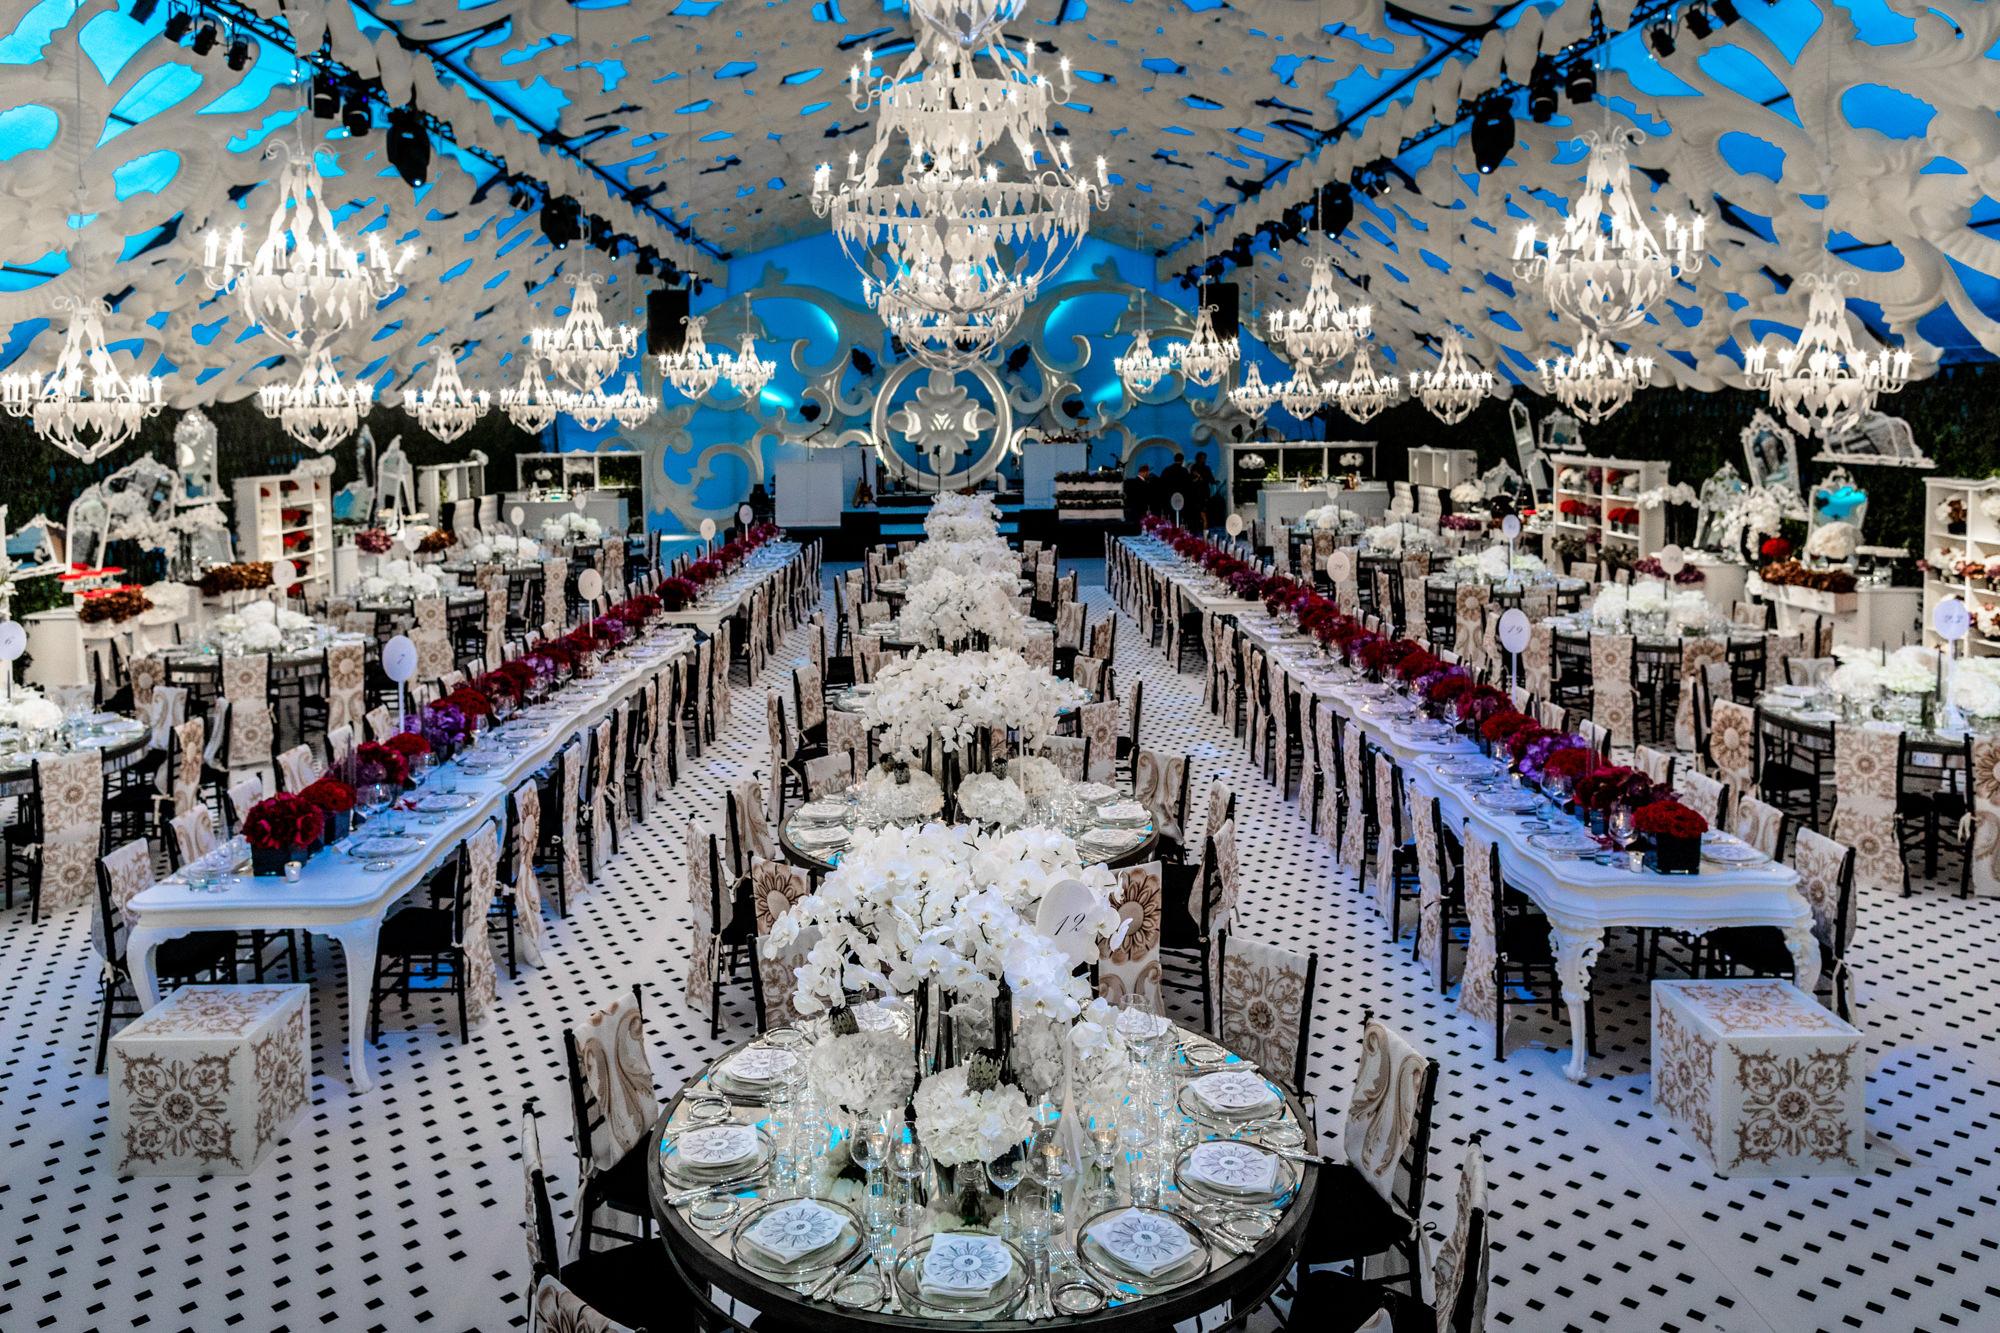 Luxury wedding reception with white decor - photo by David Bastianoni